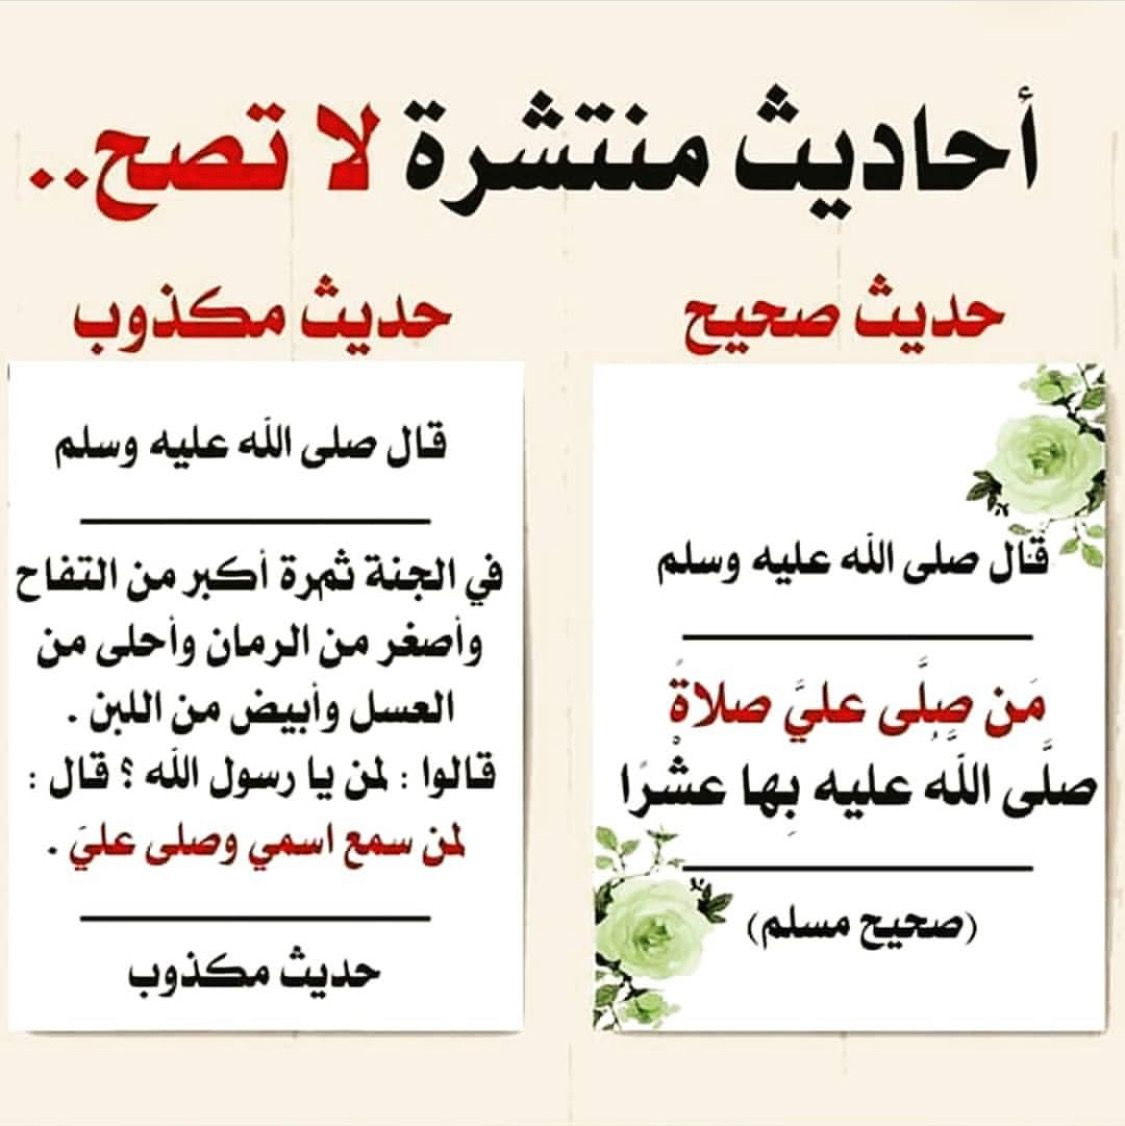 احاديث لا تصح Islamic Phrases Ahadith Hadith Sharif